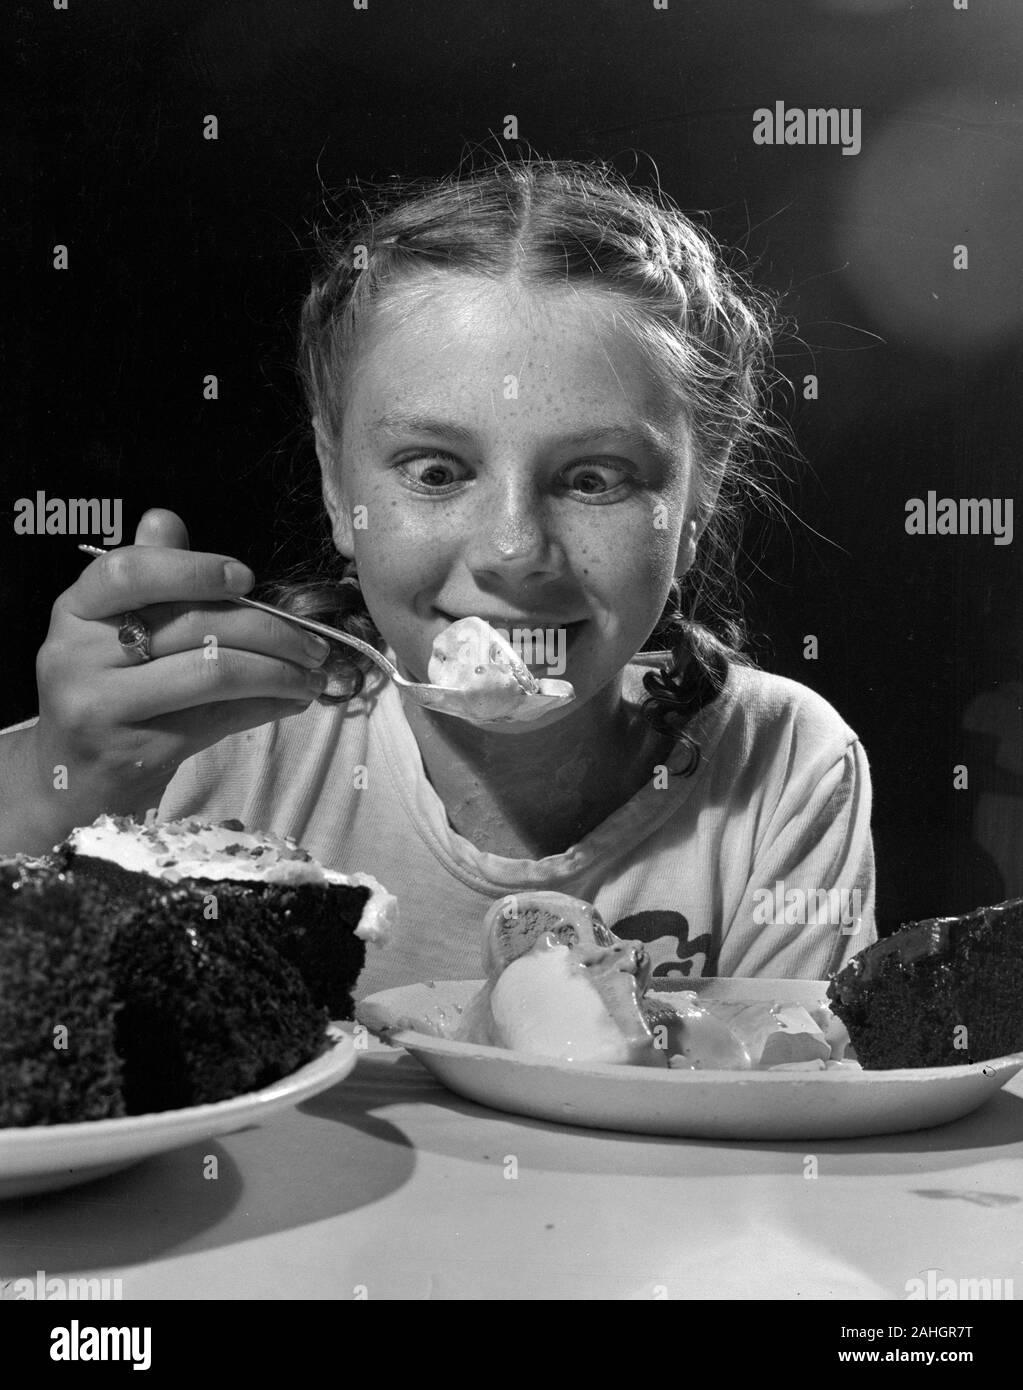 Girl eating ice cream 1946 Stock Photo